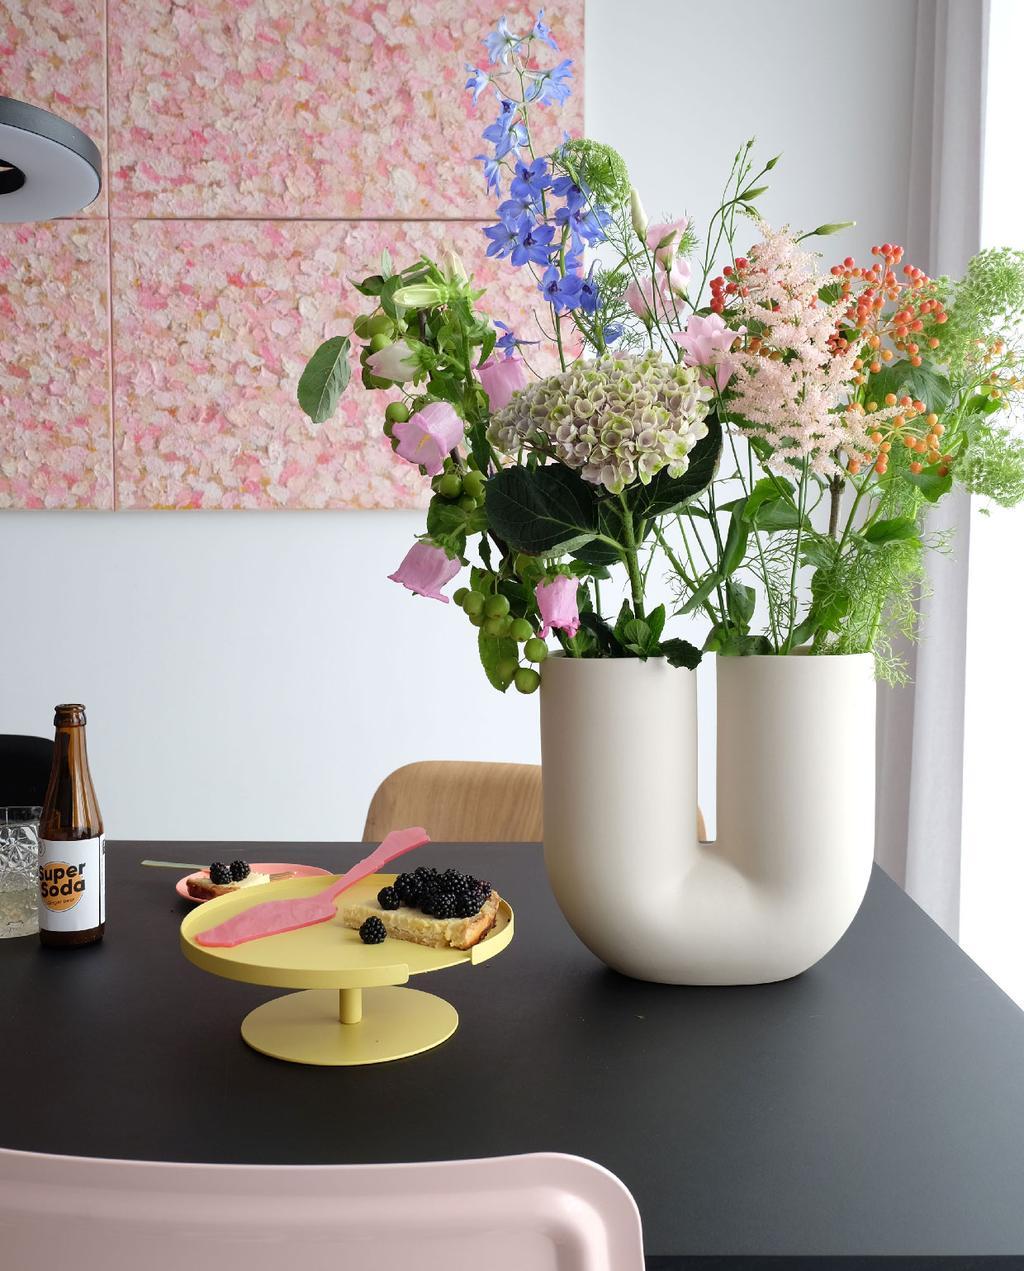 vtwonen blog prchtg | waarom prchtg een goed team is roze kunst witte bollige vaas